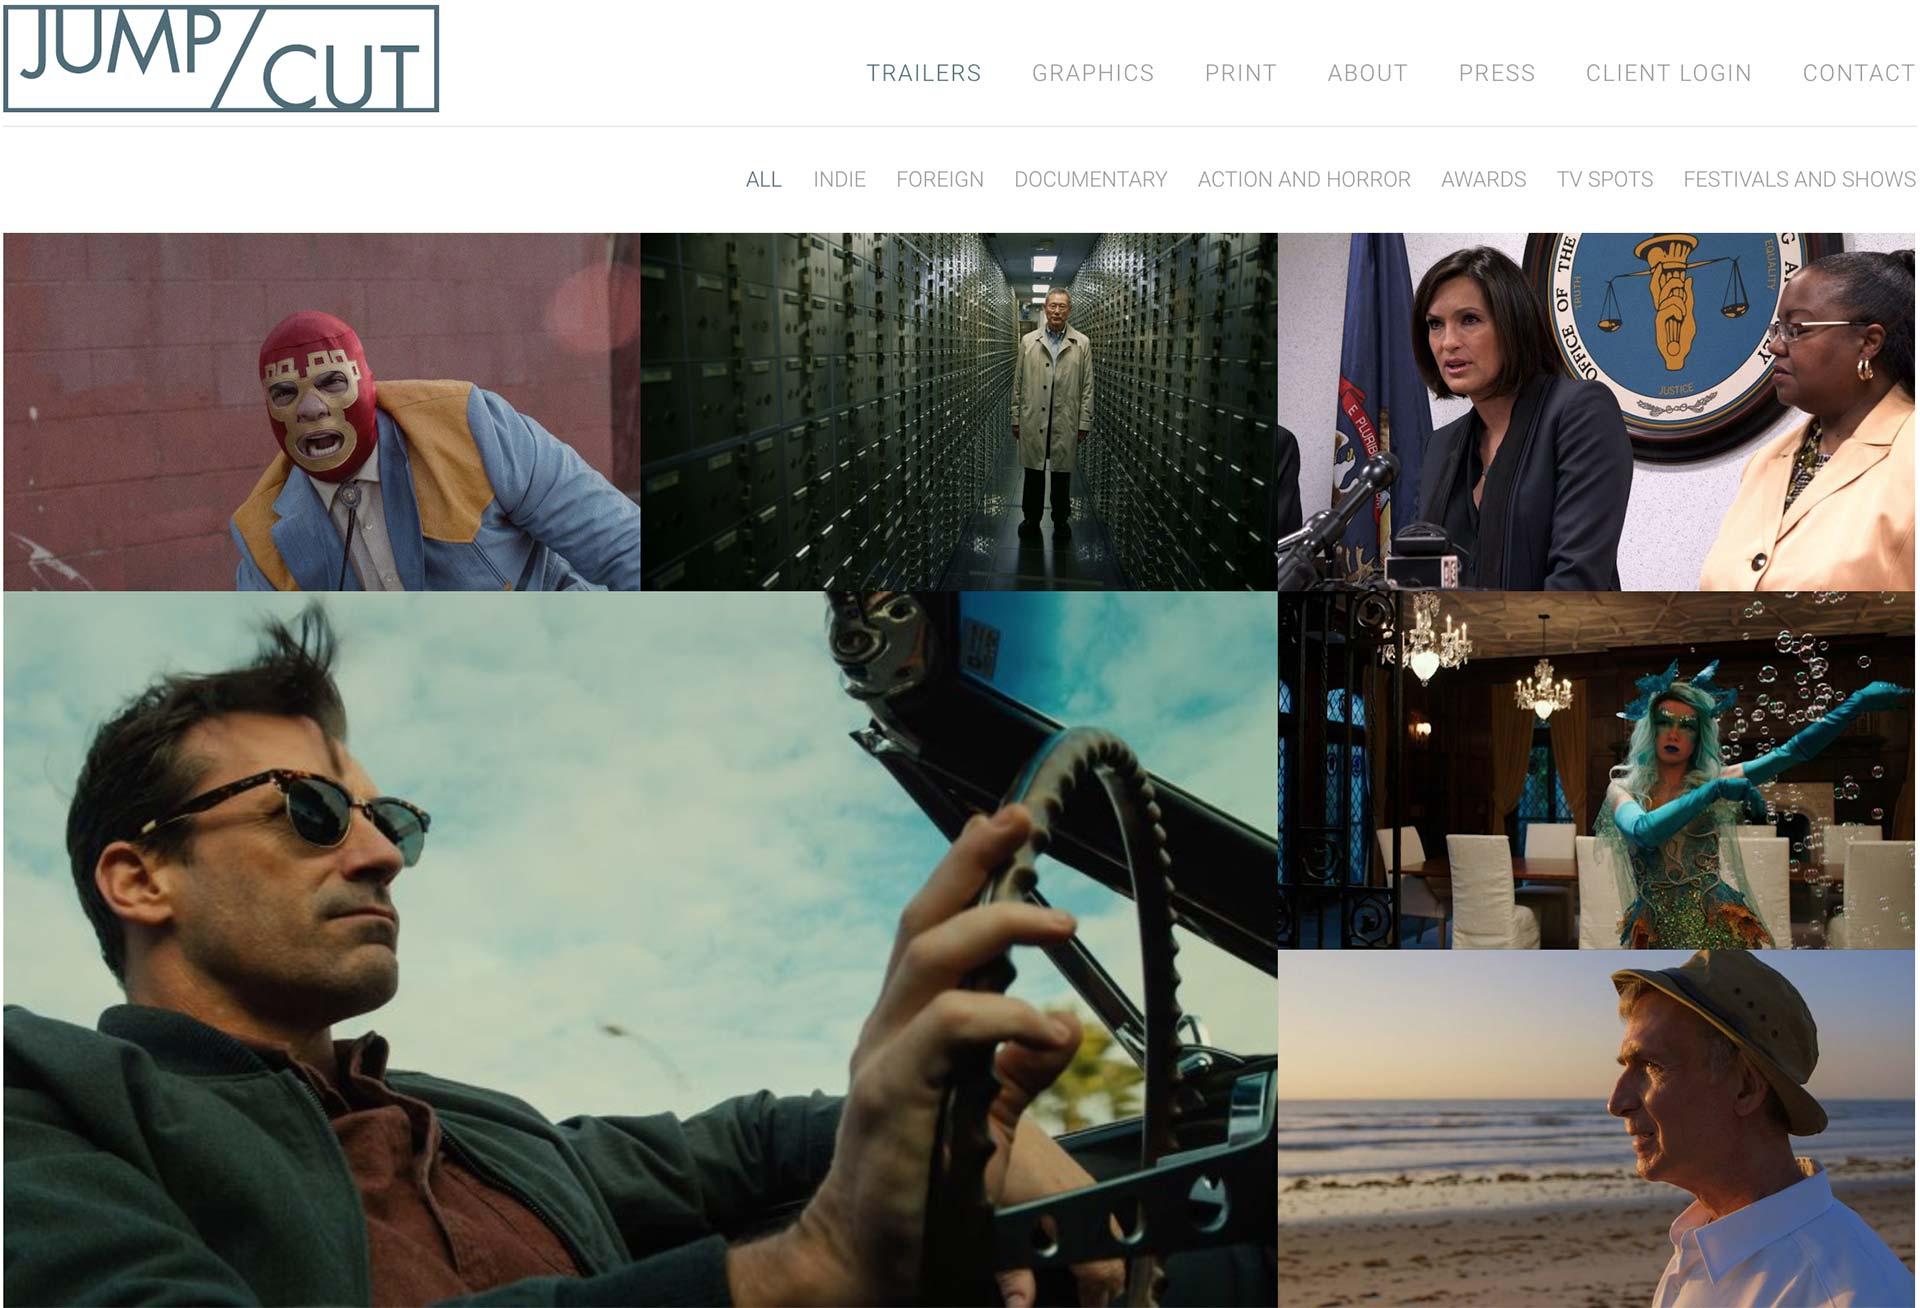 JUMP/CUT homepage